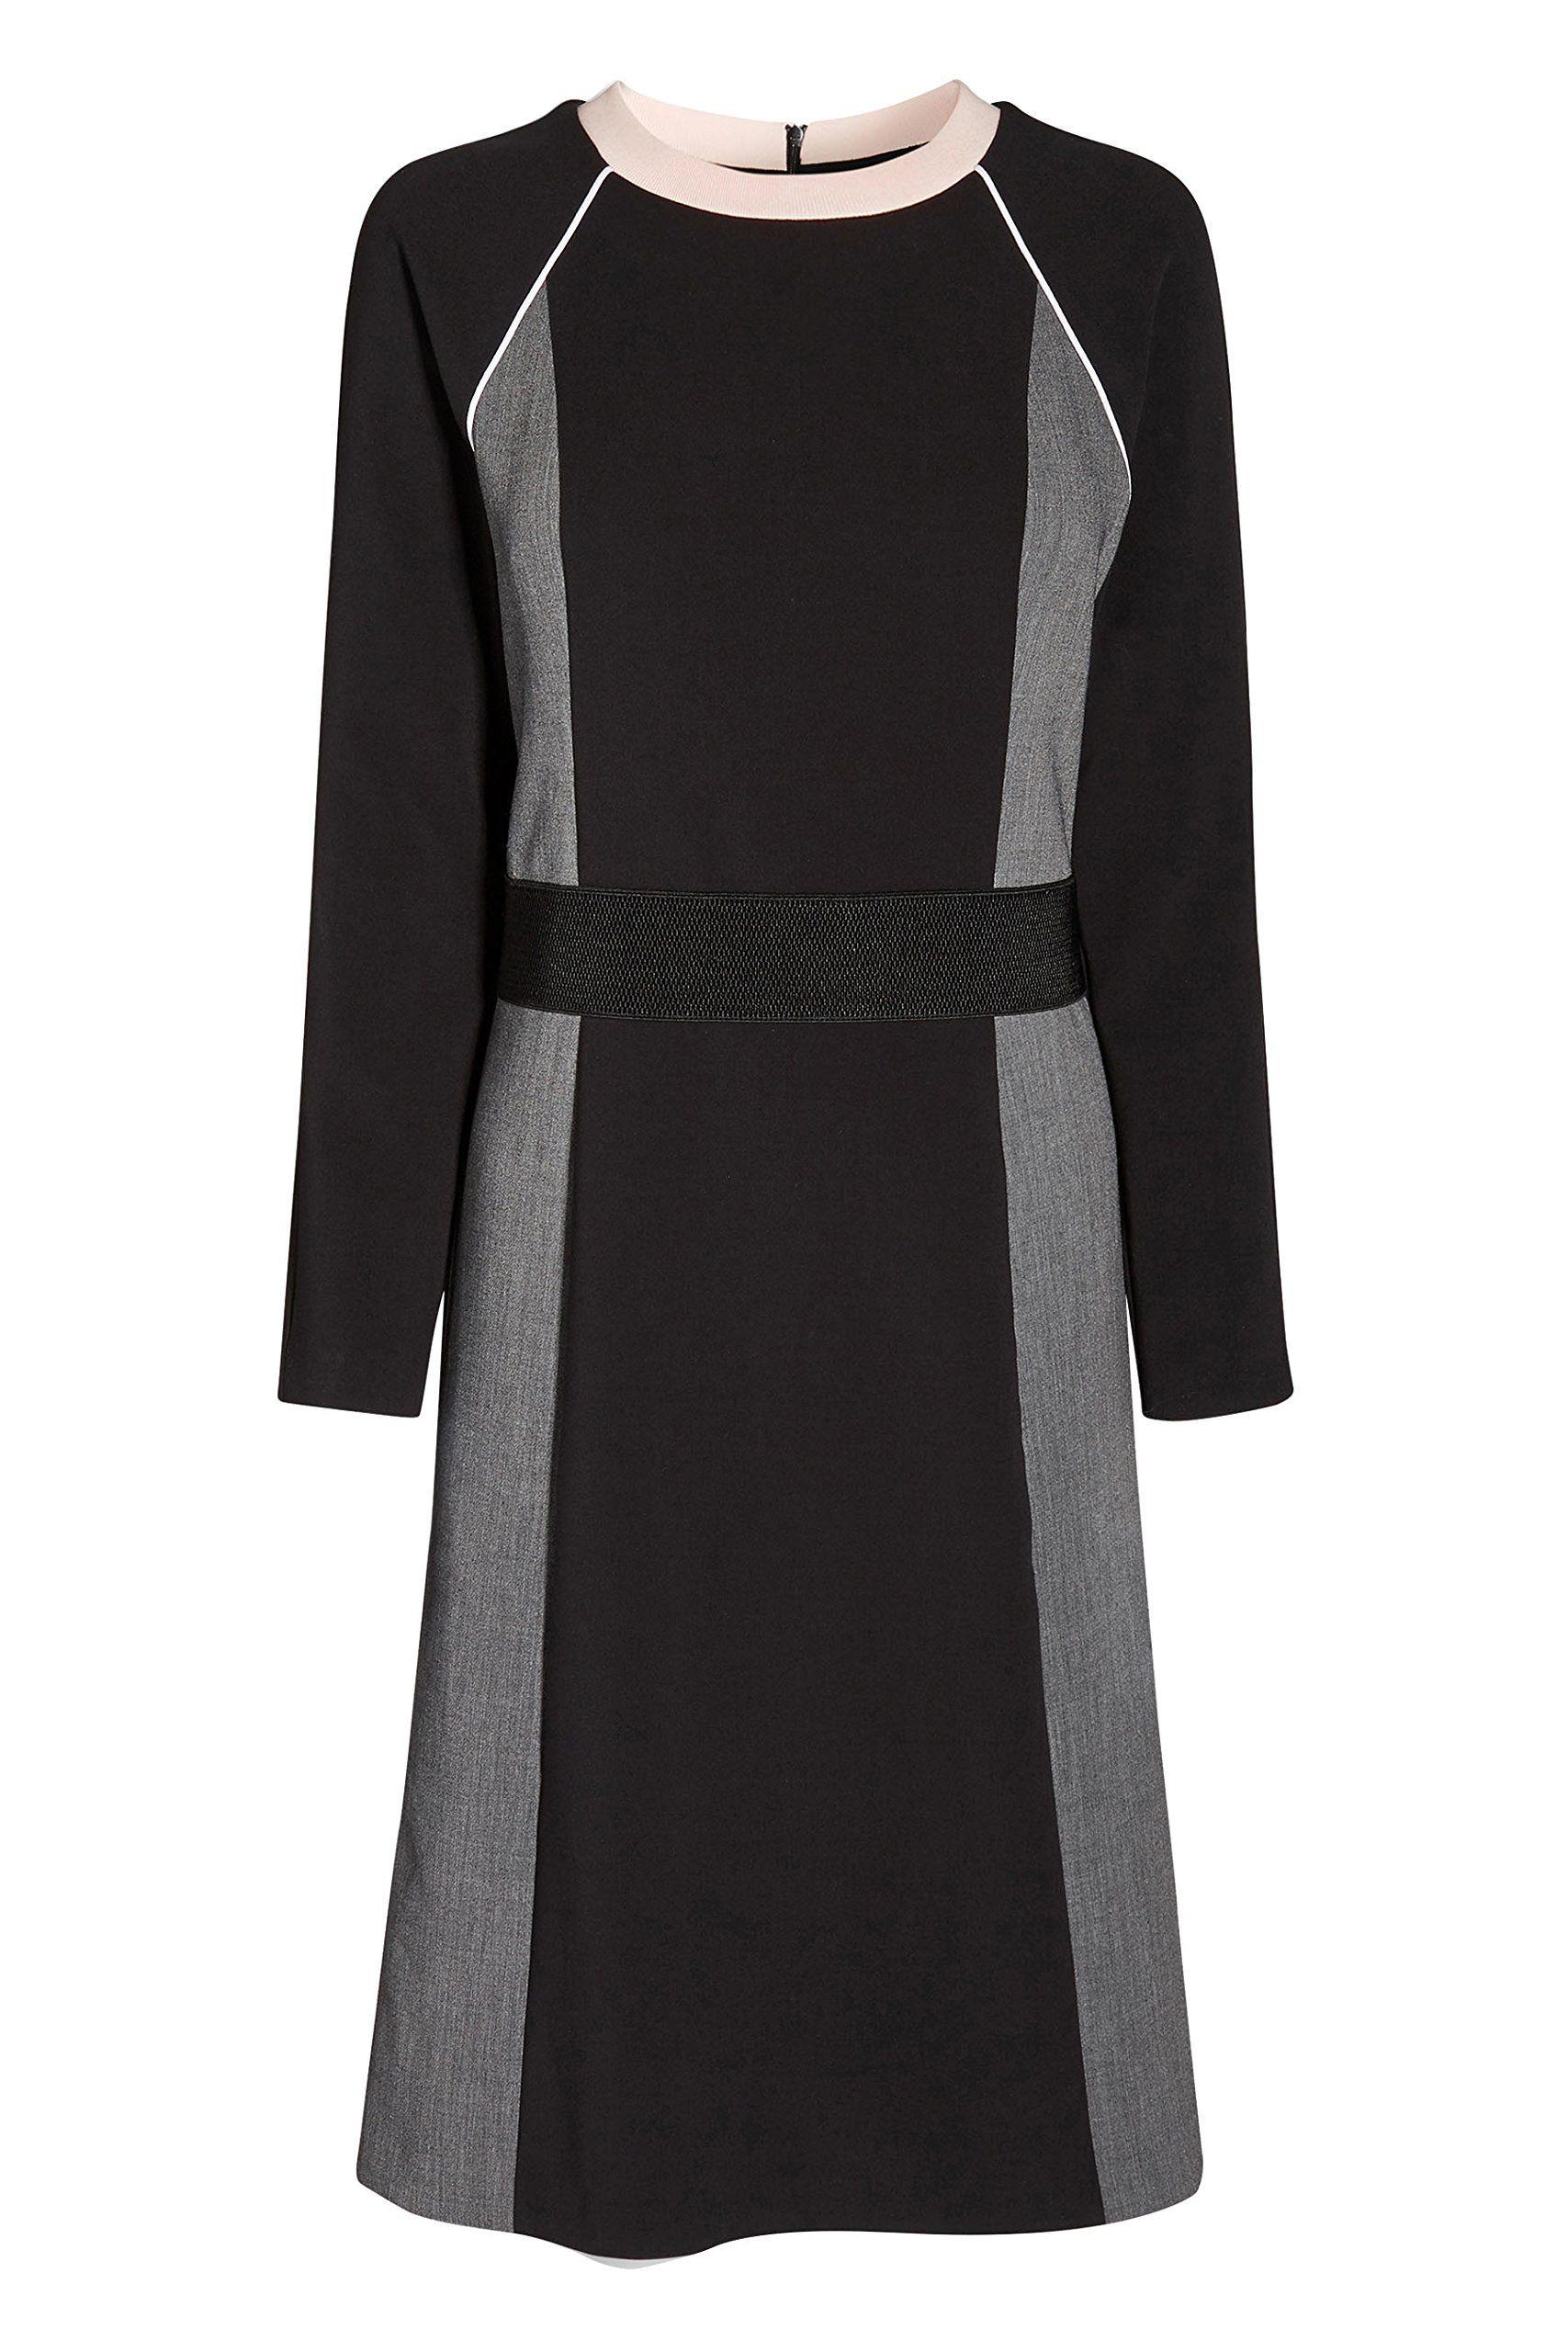 Next women black grey colourblock long sleeve dress petite fit next